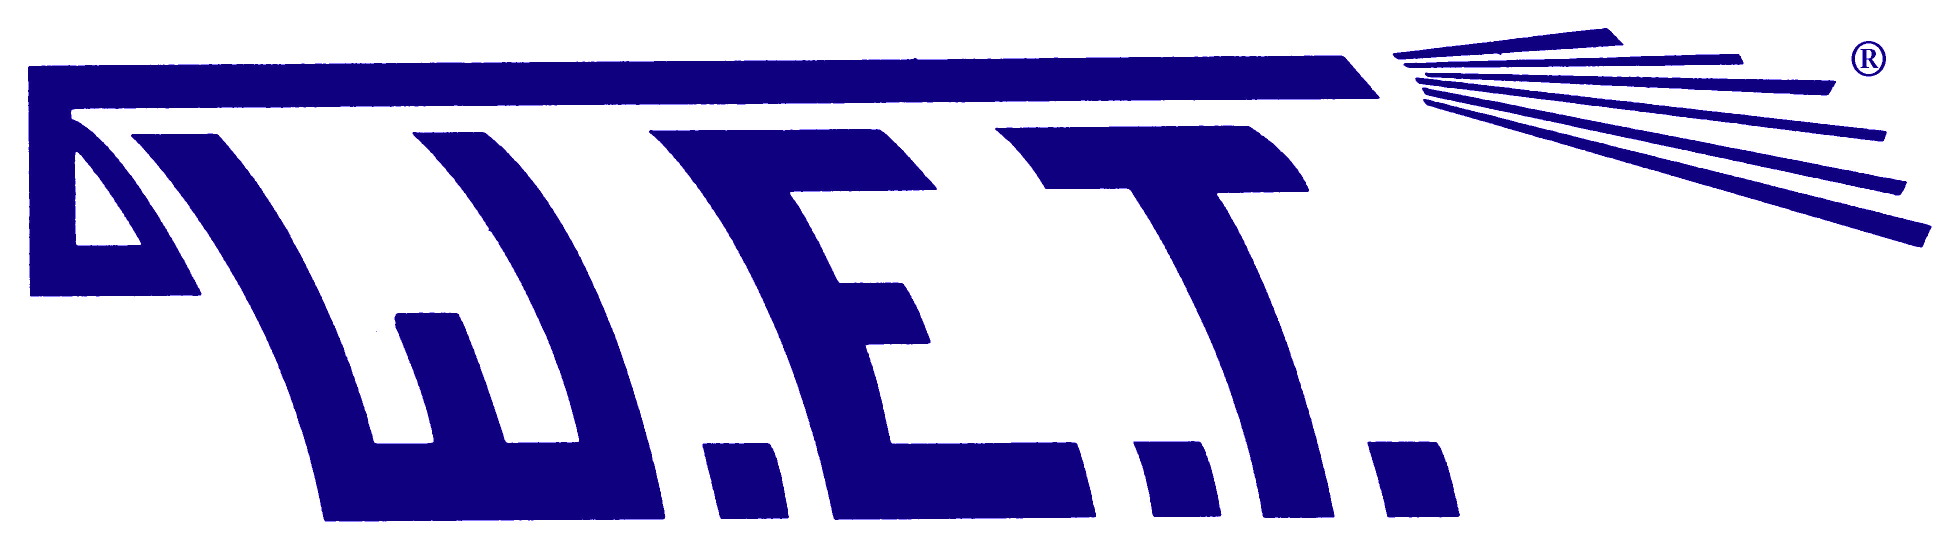 WET-logo-blue